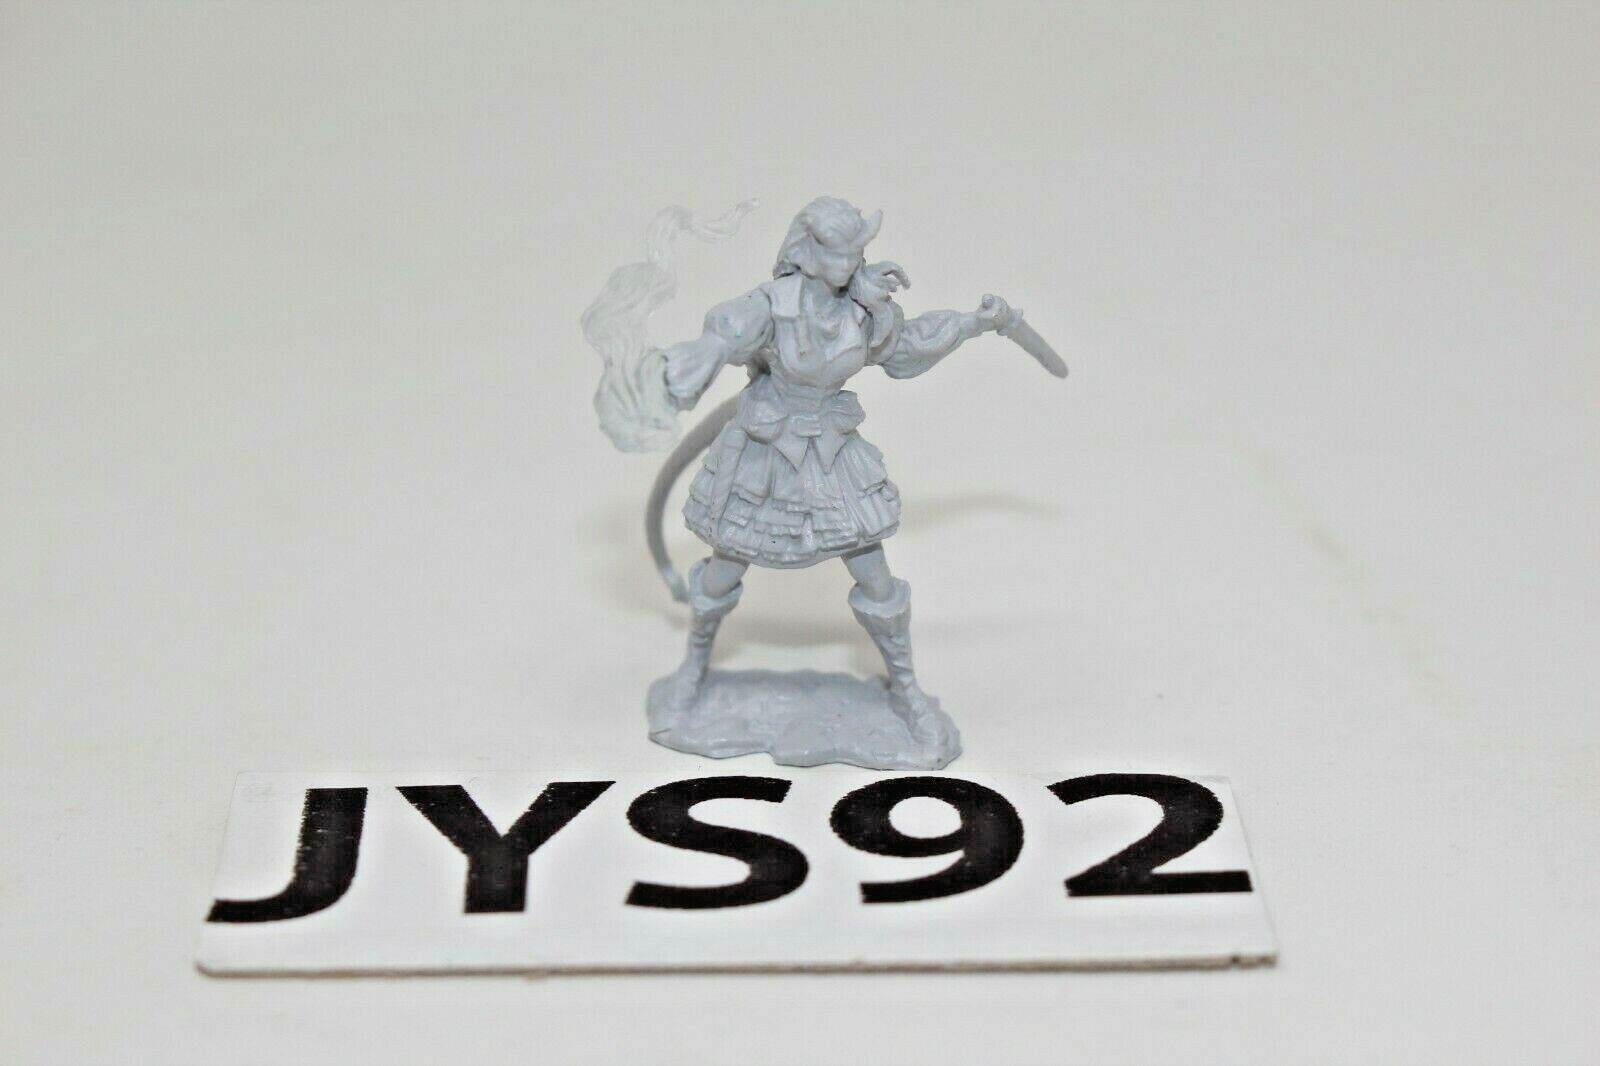 Warhammer Fantasy RPG Miniture Tiefling Sorcerer - JYS92